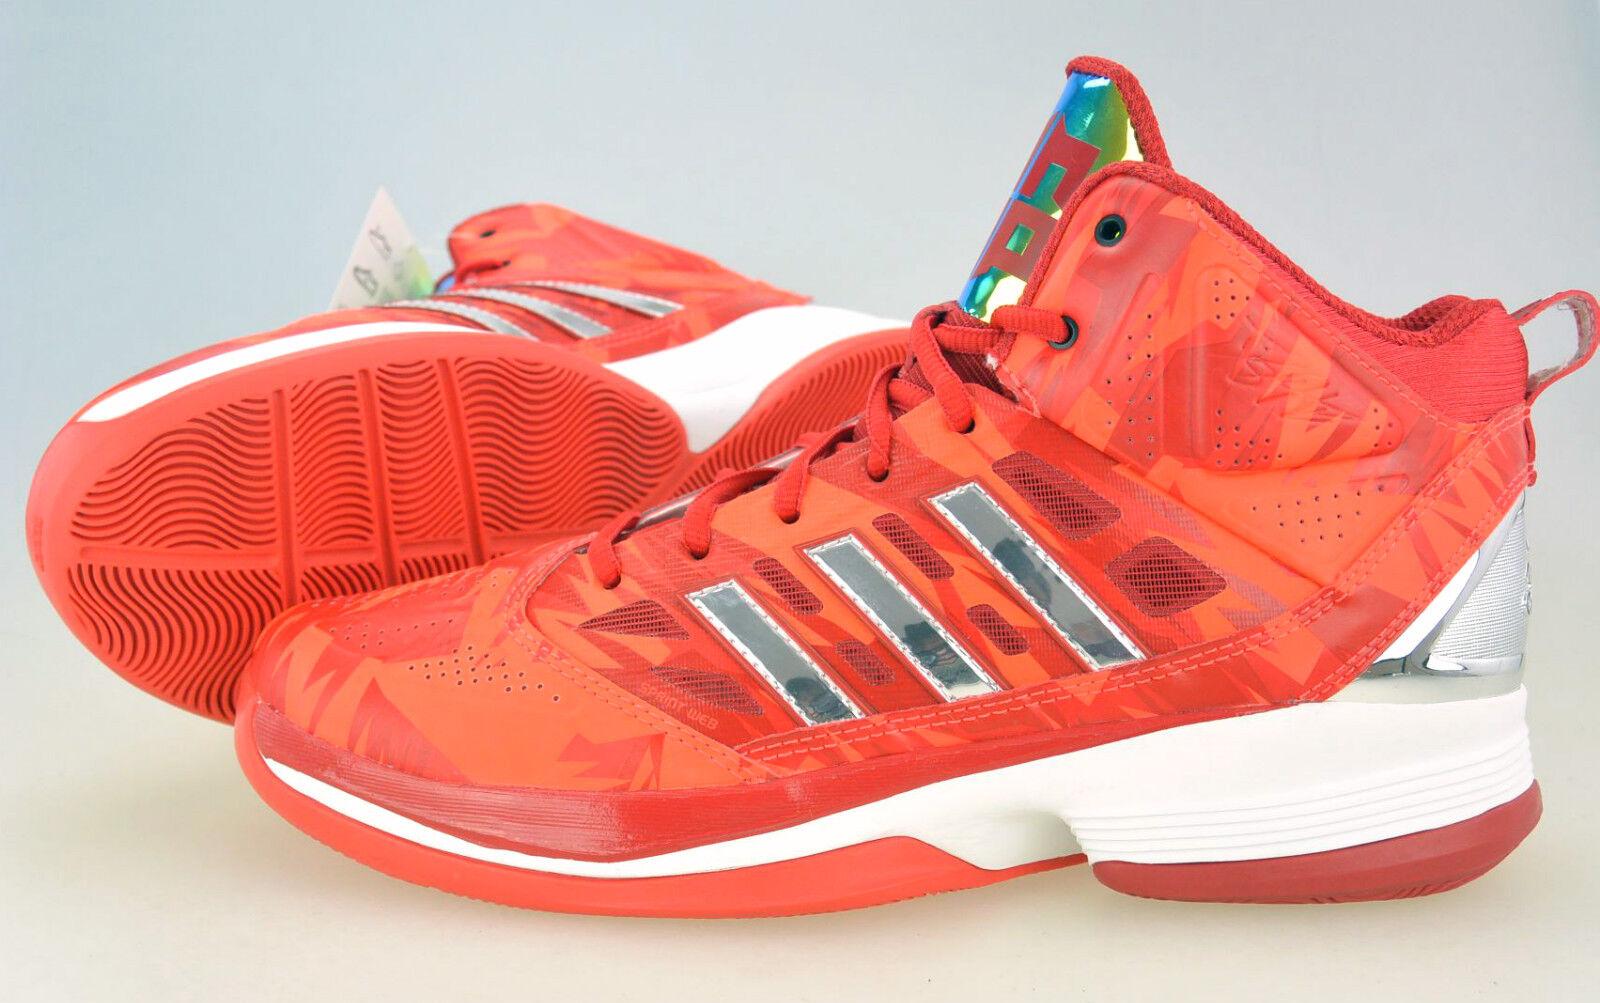 Adidas D Howard Light Basketball Männer Zapatos Hombre Sneaker Sneaker Hombre - Big Talla 317968